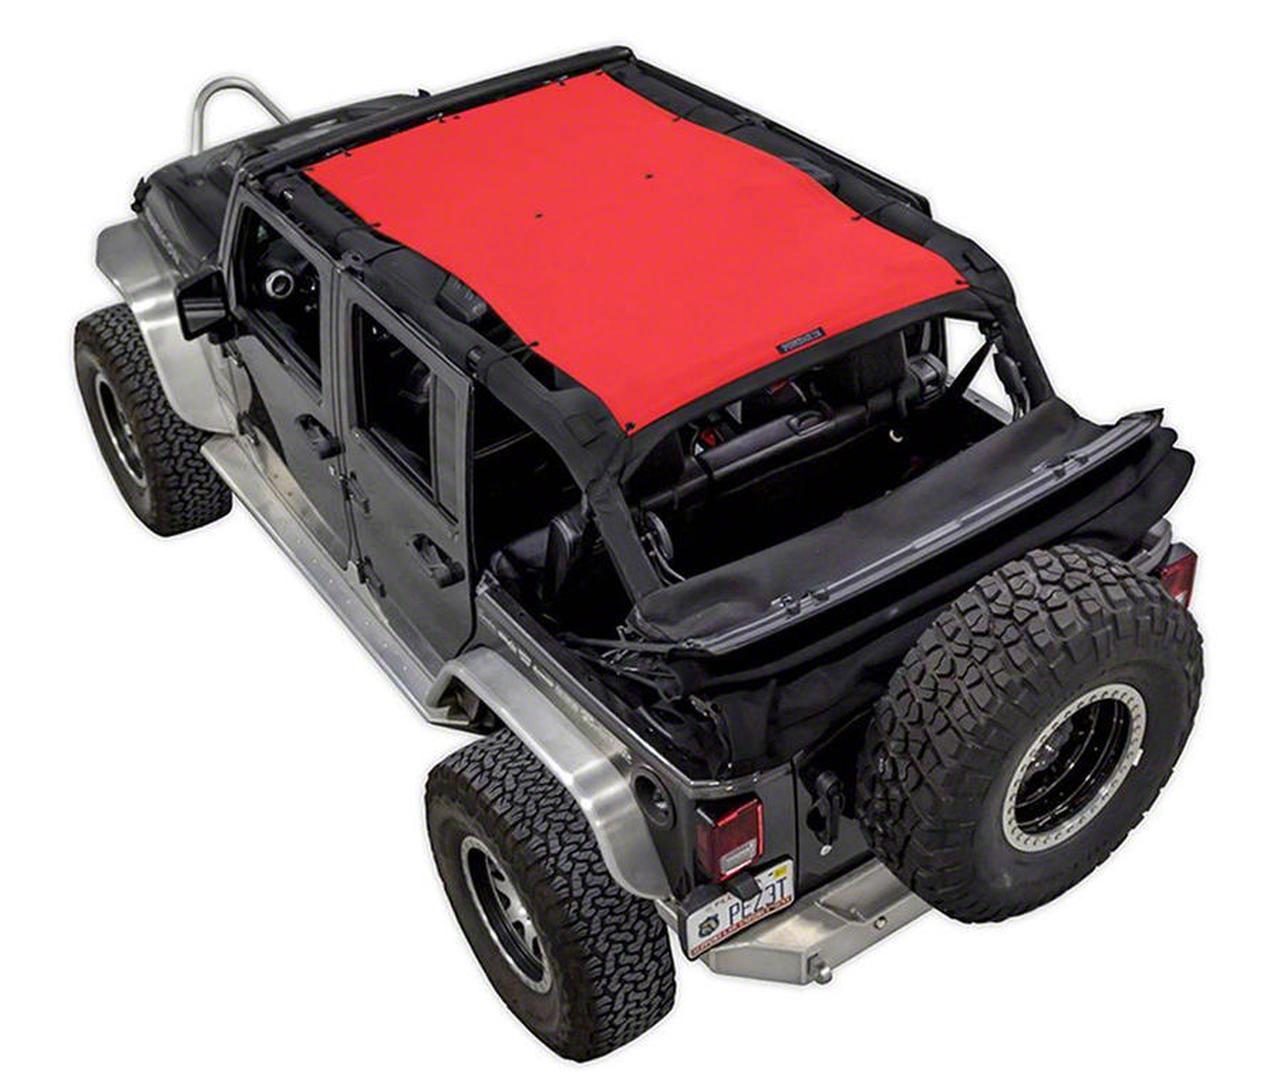 SpiderWeb Shade Trail Mesh ShadeTop - Red (07-18 Jeep Wrangler JK 4 Door)